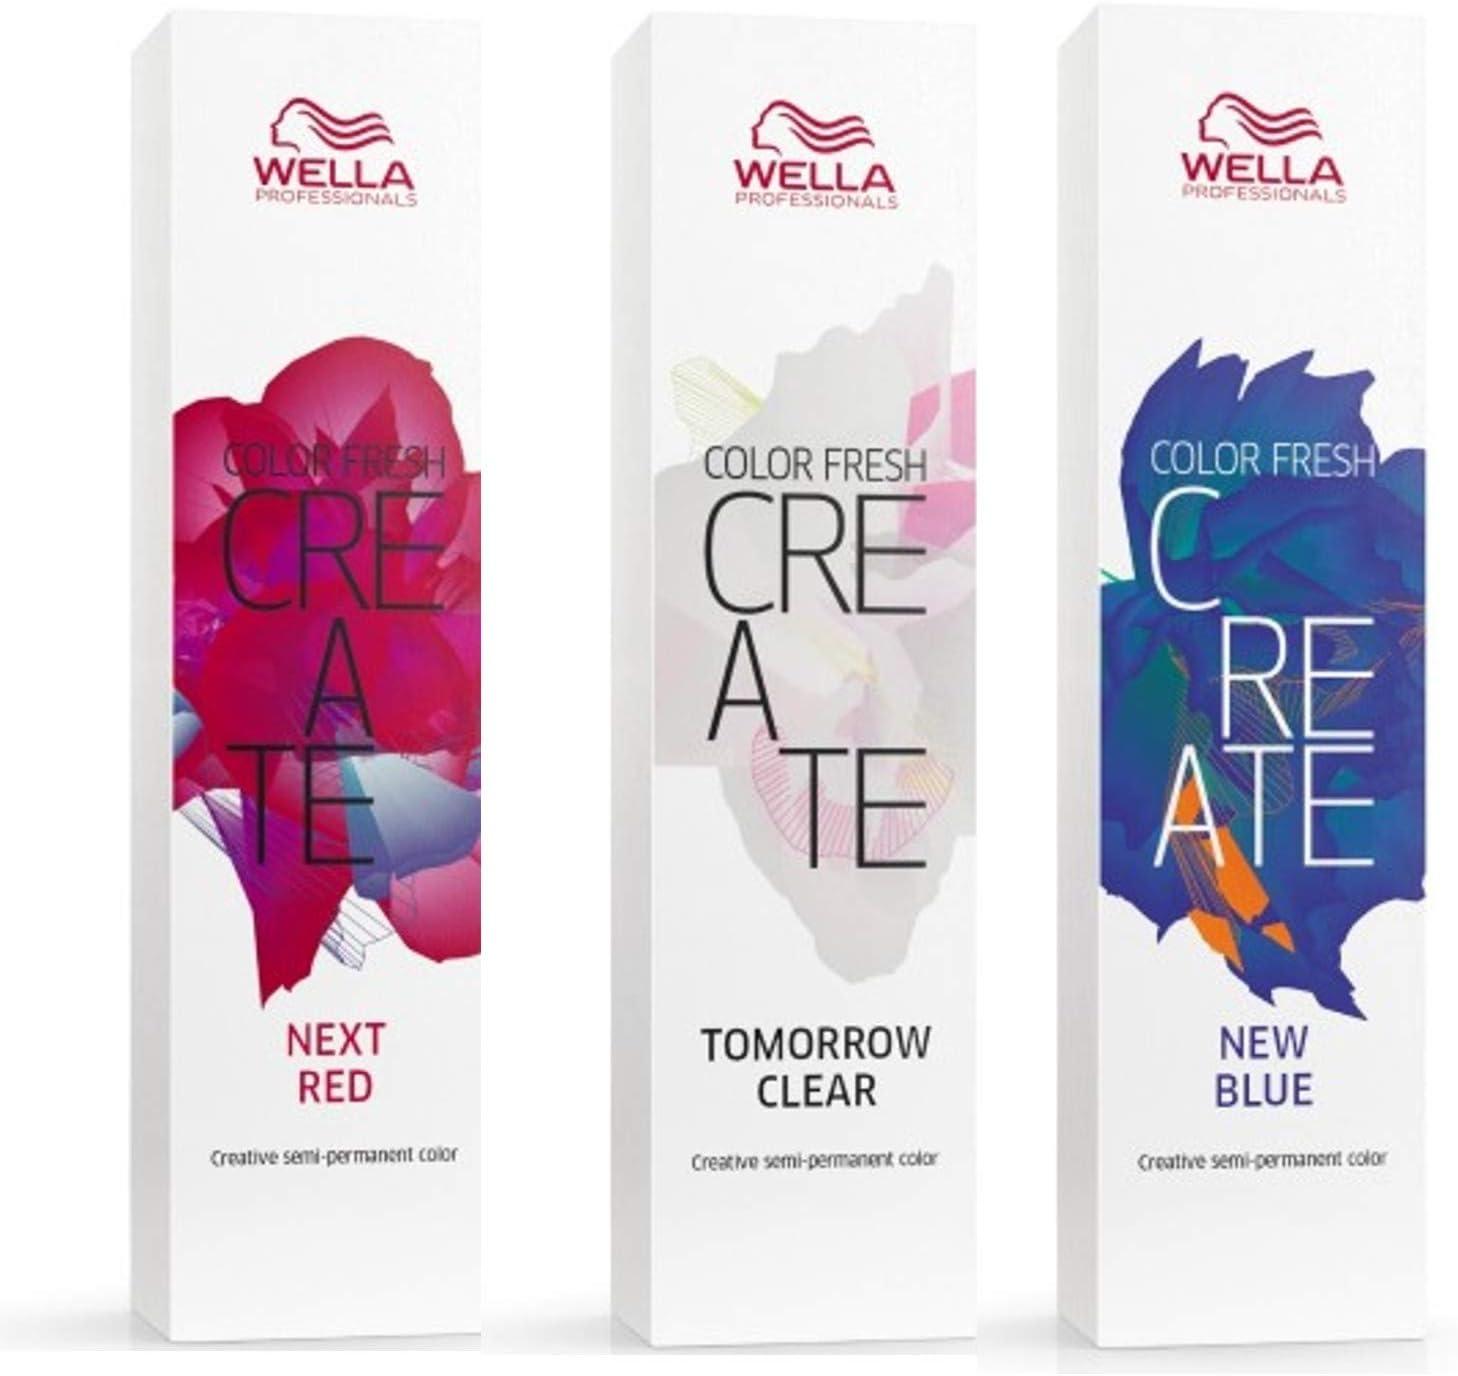 Wella Color Fresh Create 9819/6, 60 ml